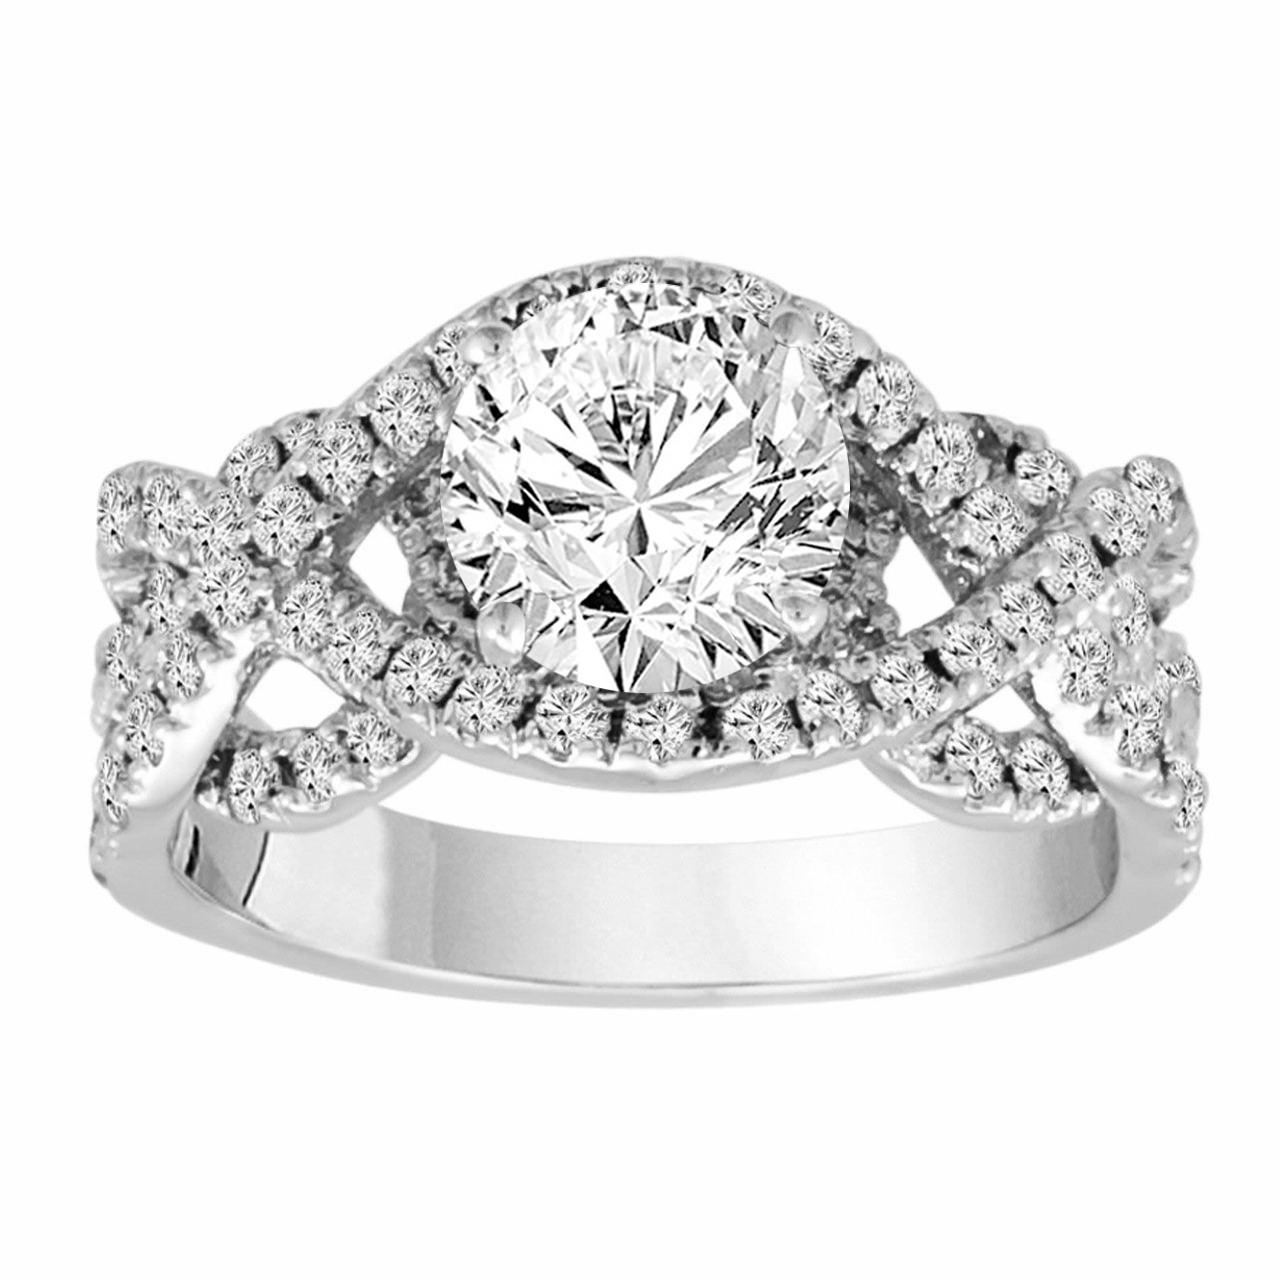 04 Carat Bands: 2.04 Carat Diamond Engagement Ring, Gia Certified Unique